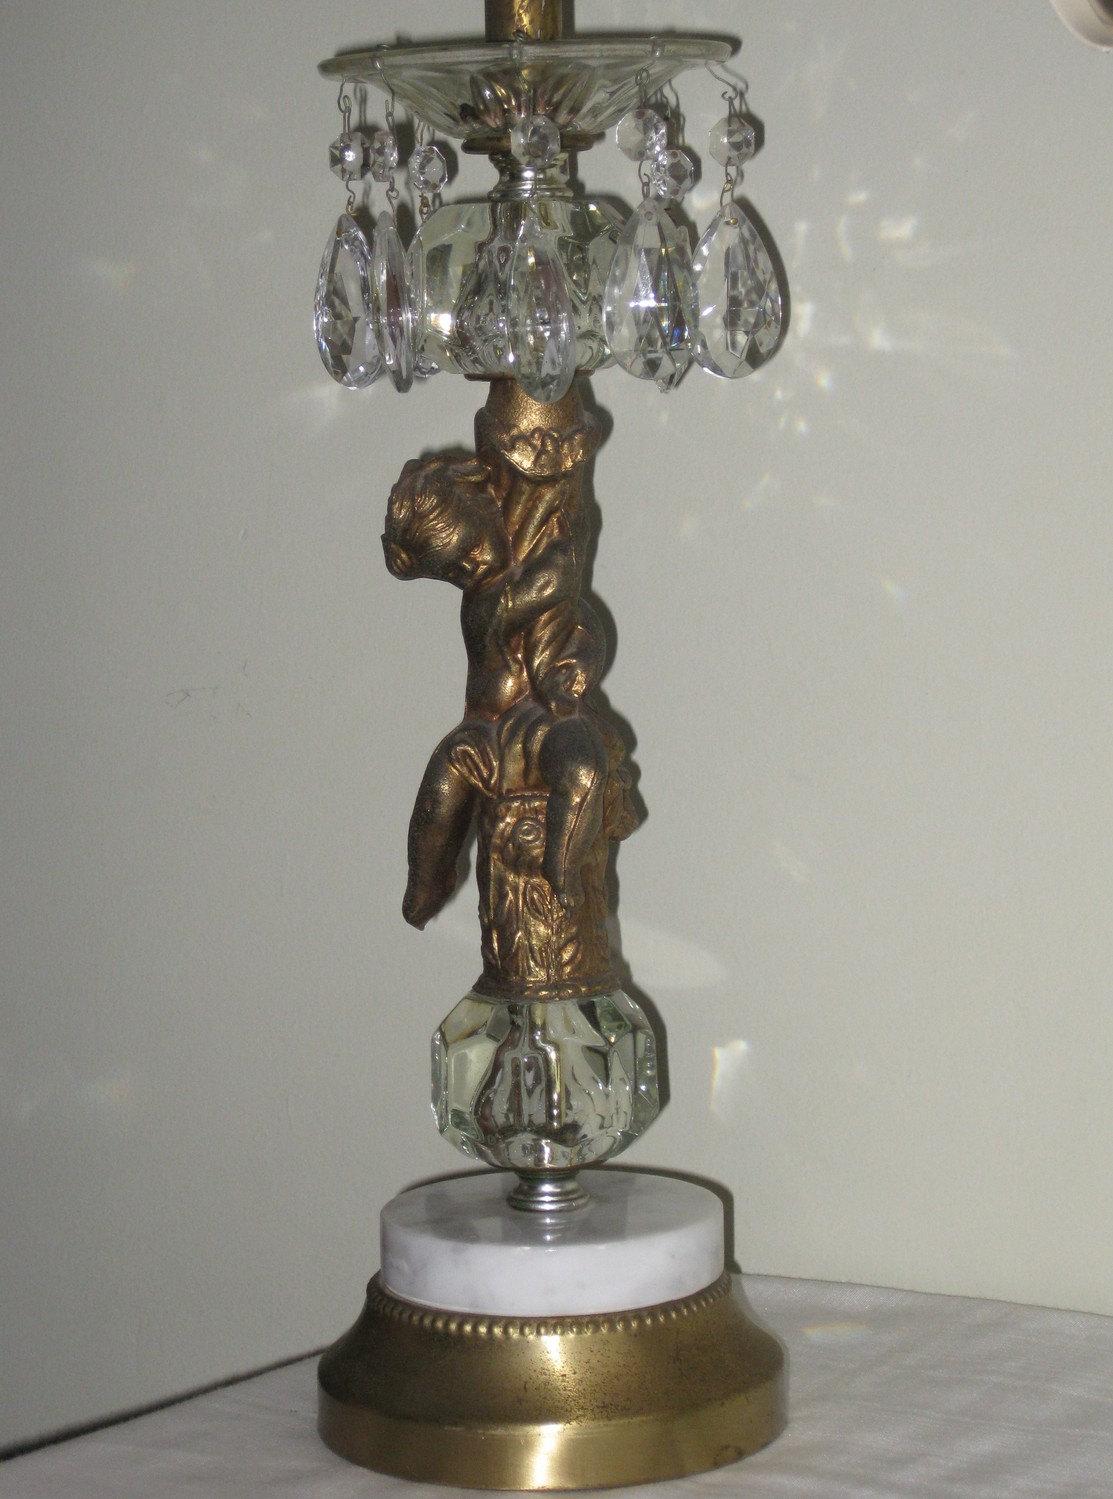 Vintage Brass Cherub Lamp With Glass Prisms By